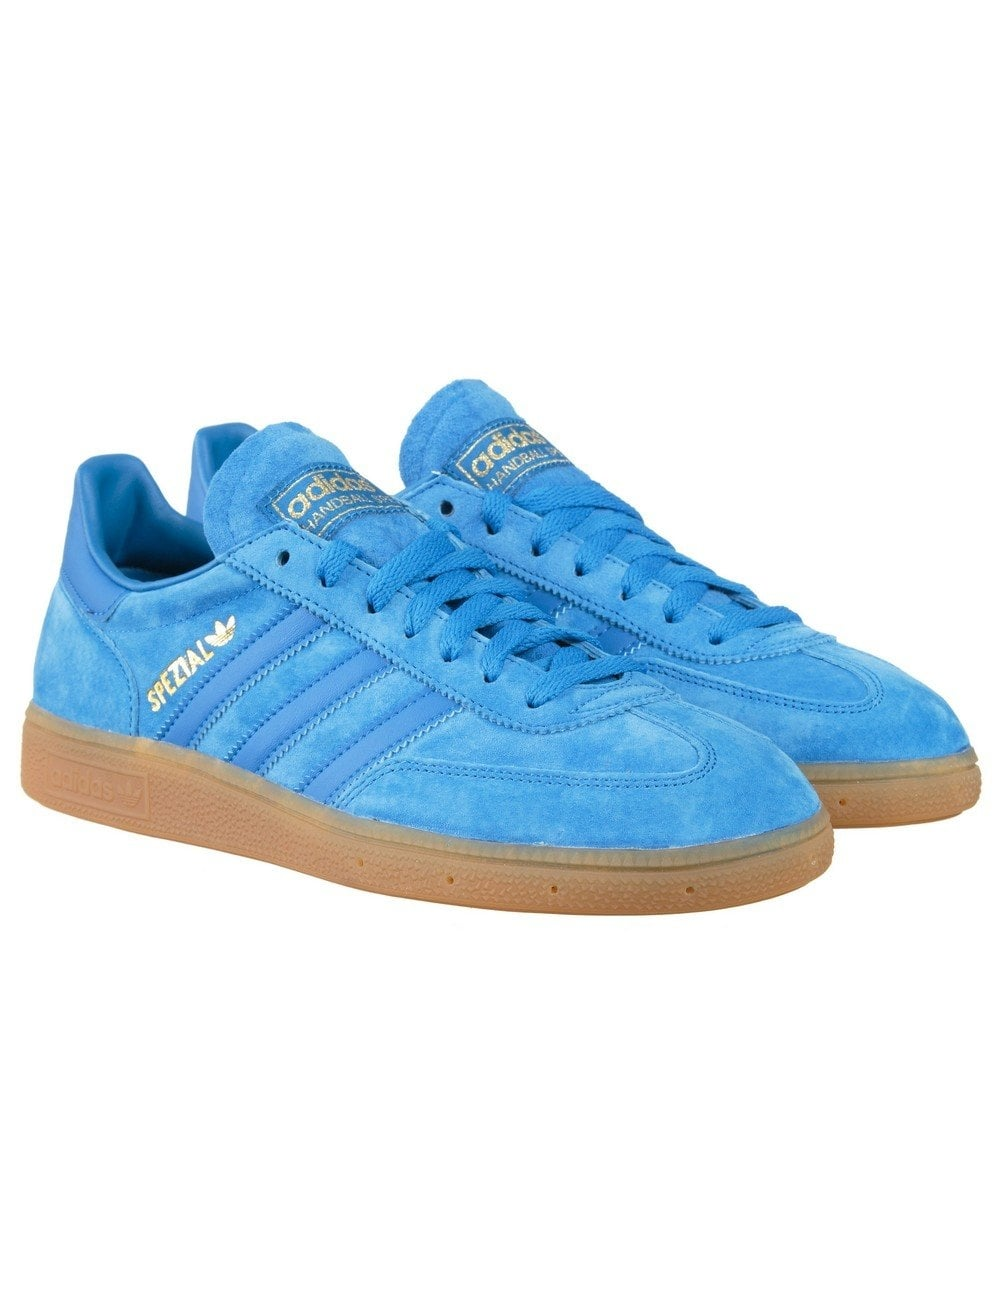 69fca032b39 Adidas Originals Spezial Shoes - Bluebird Blue - Footwear from Fat ...